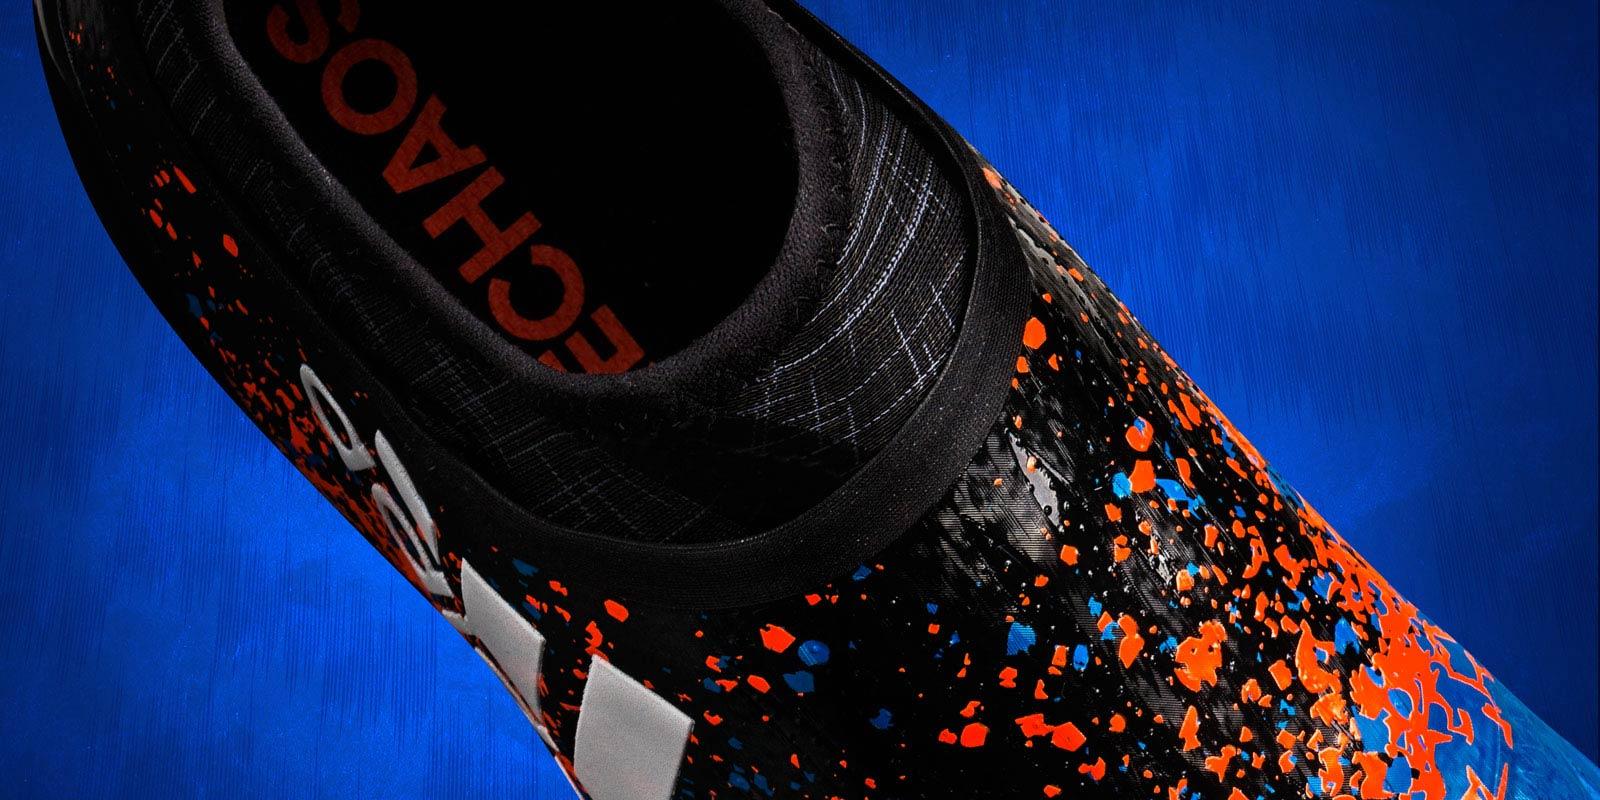 Adidas X 16+ Purechaos Paris Pack